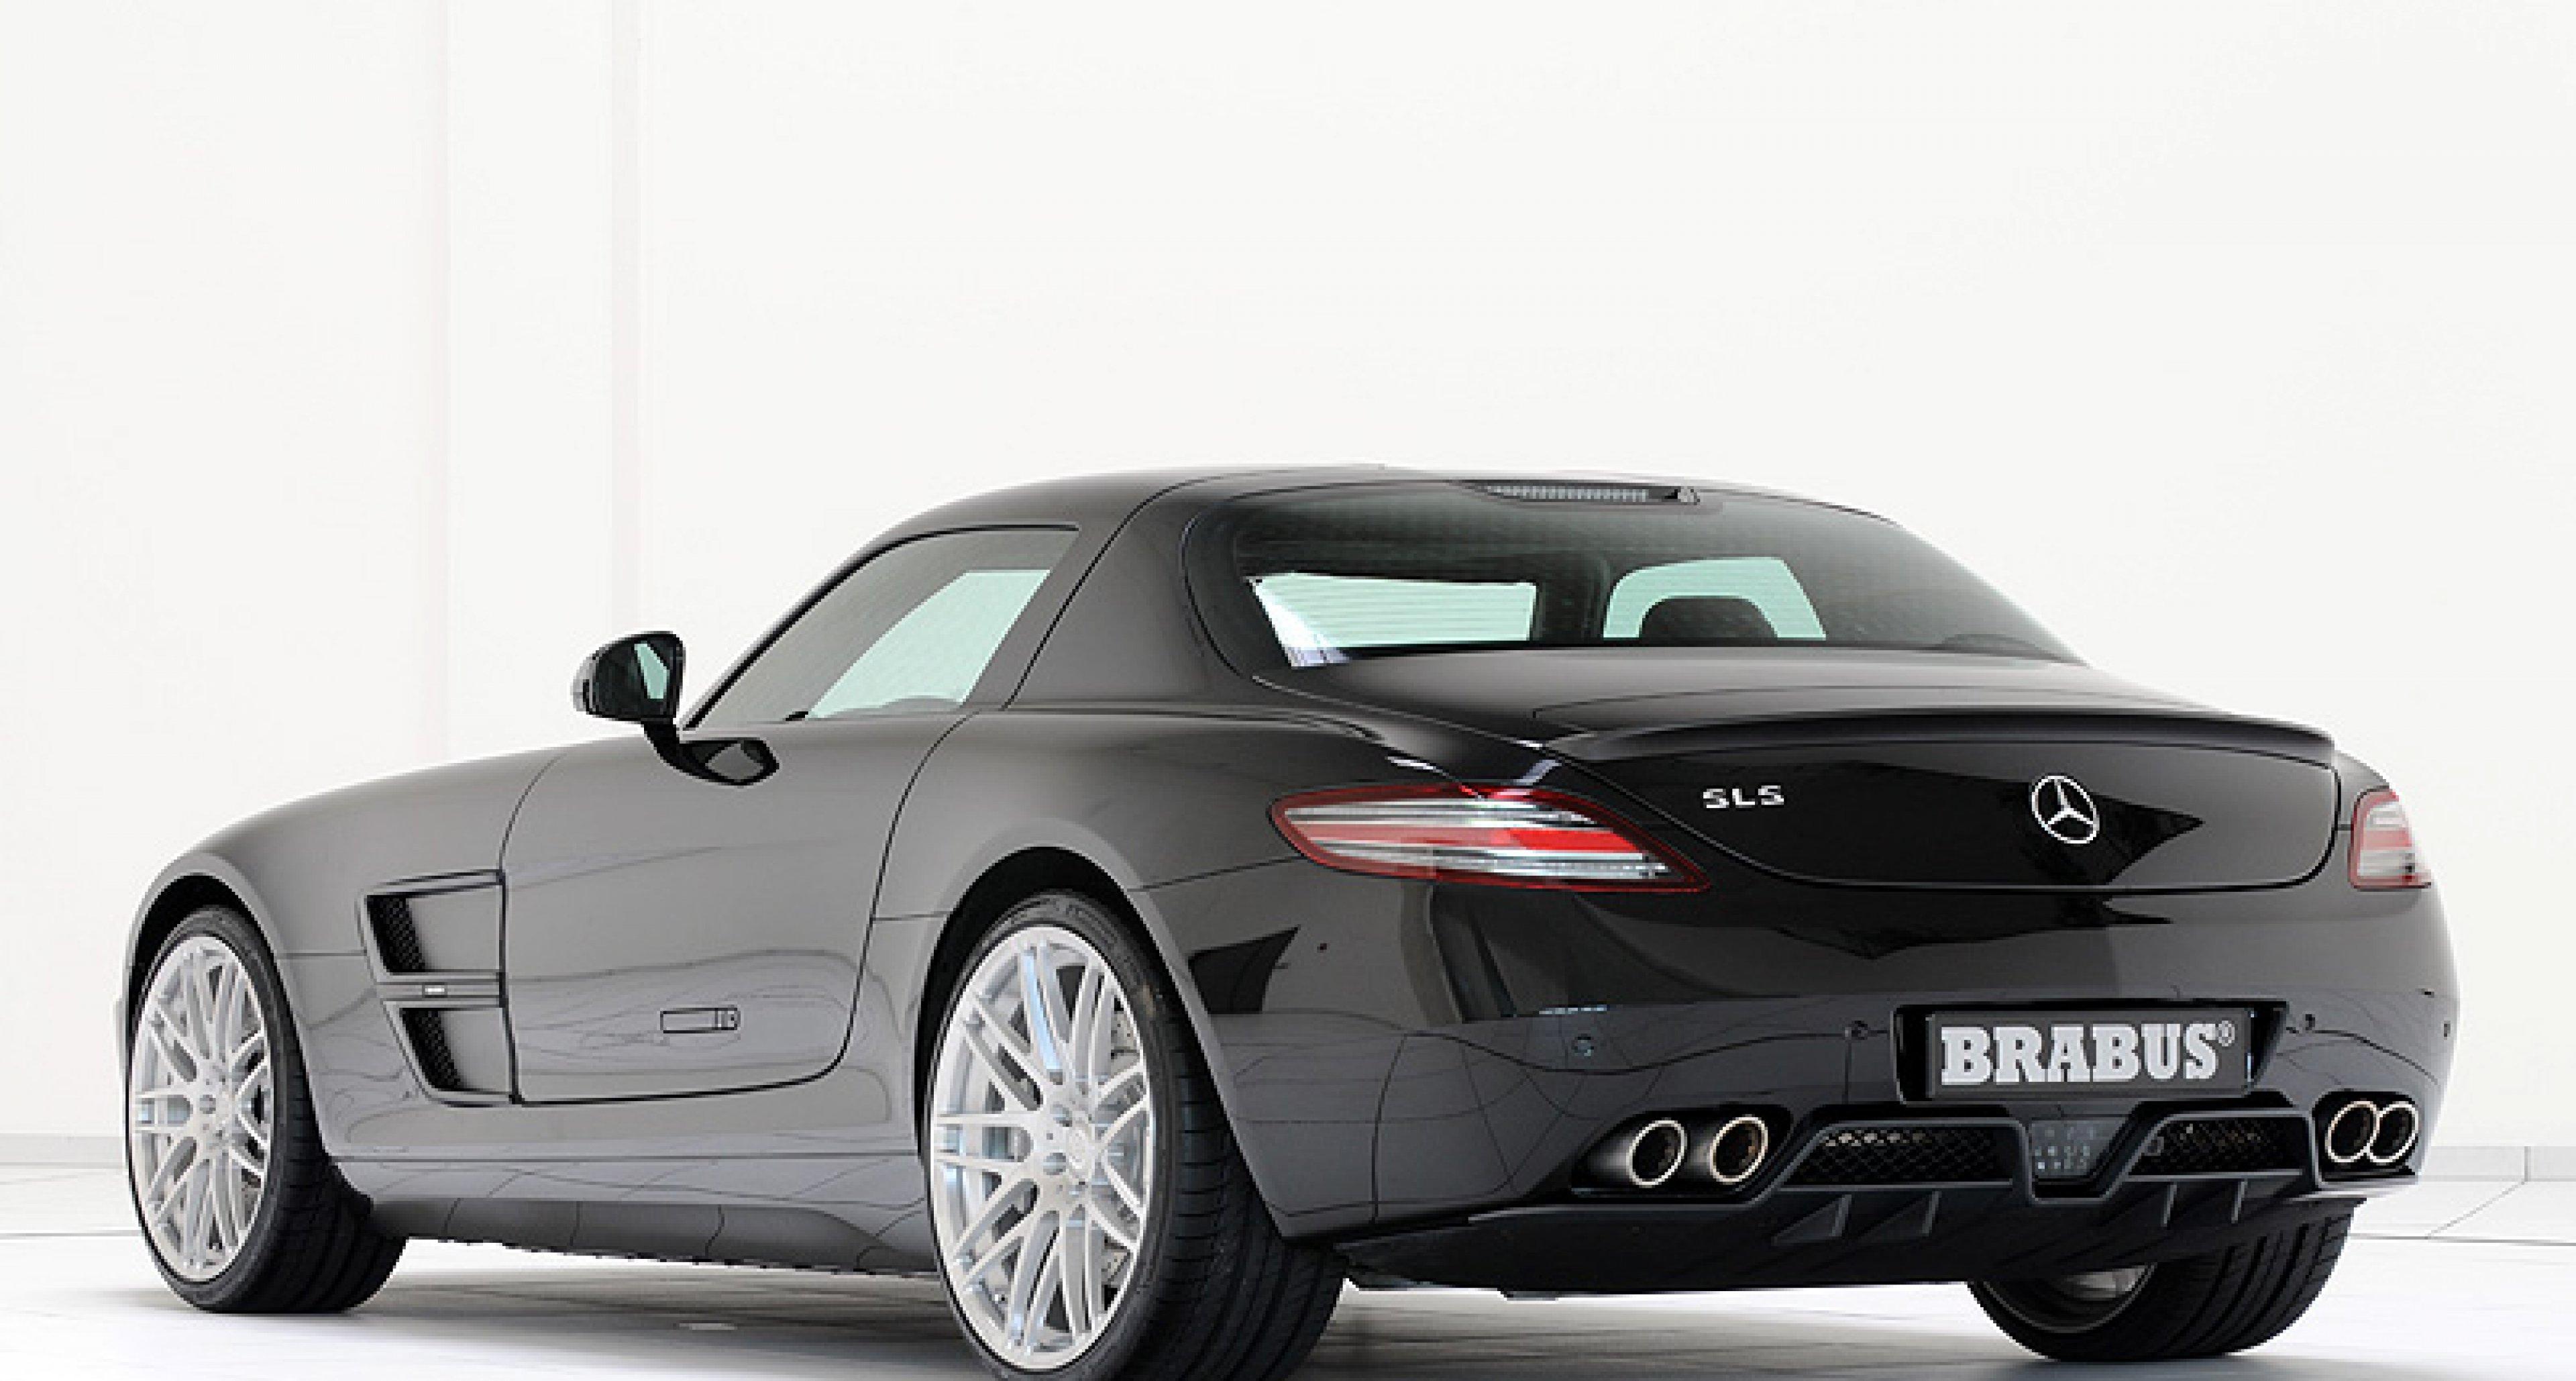 Mercedes-Benz SLS AMG by Brabus